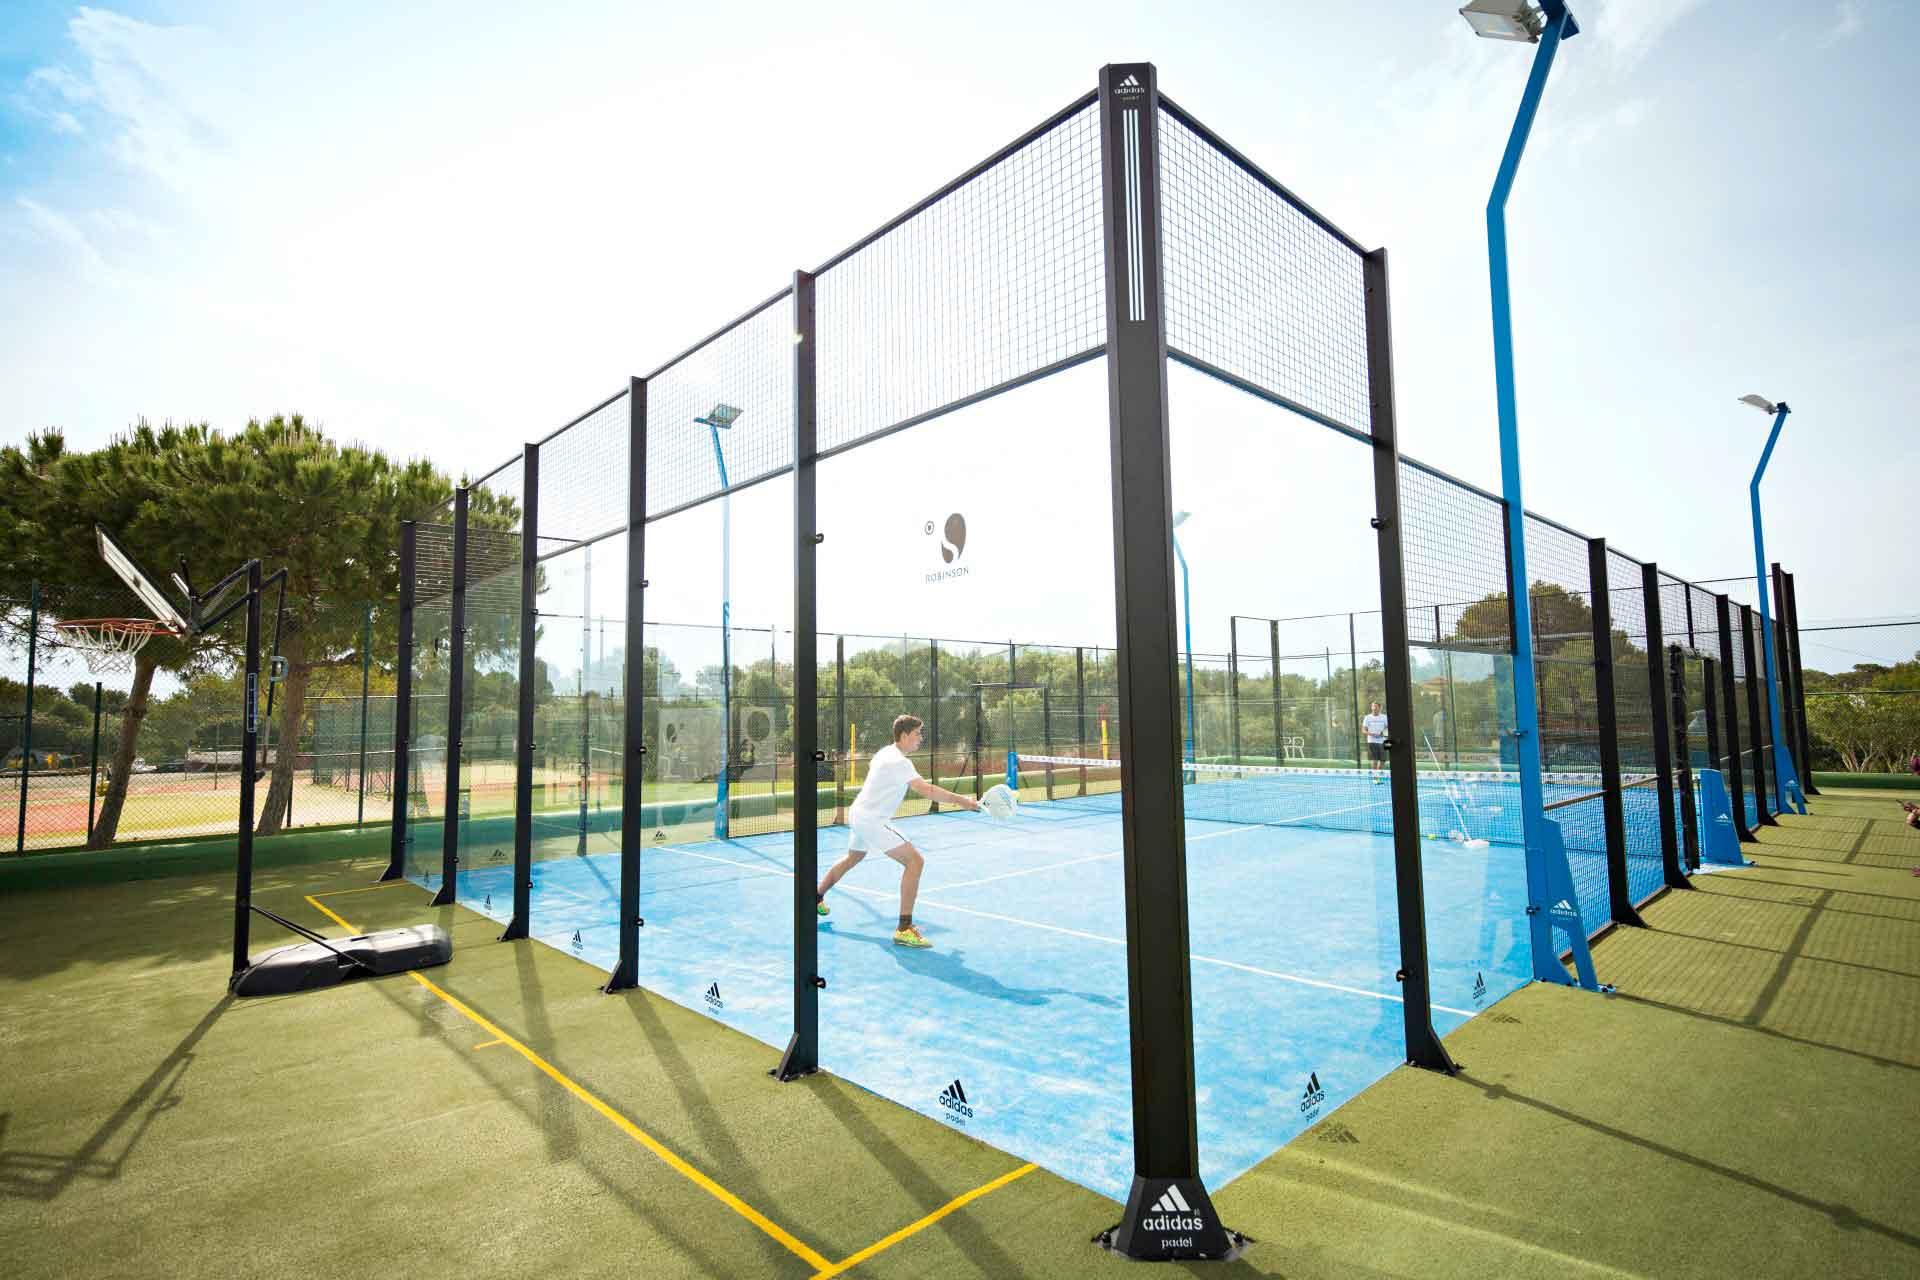 ROBINSON CLUB CALA SERENA - Paddle Court